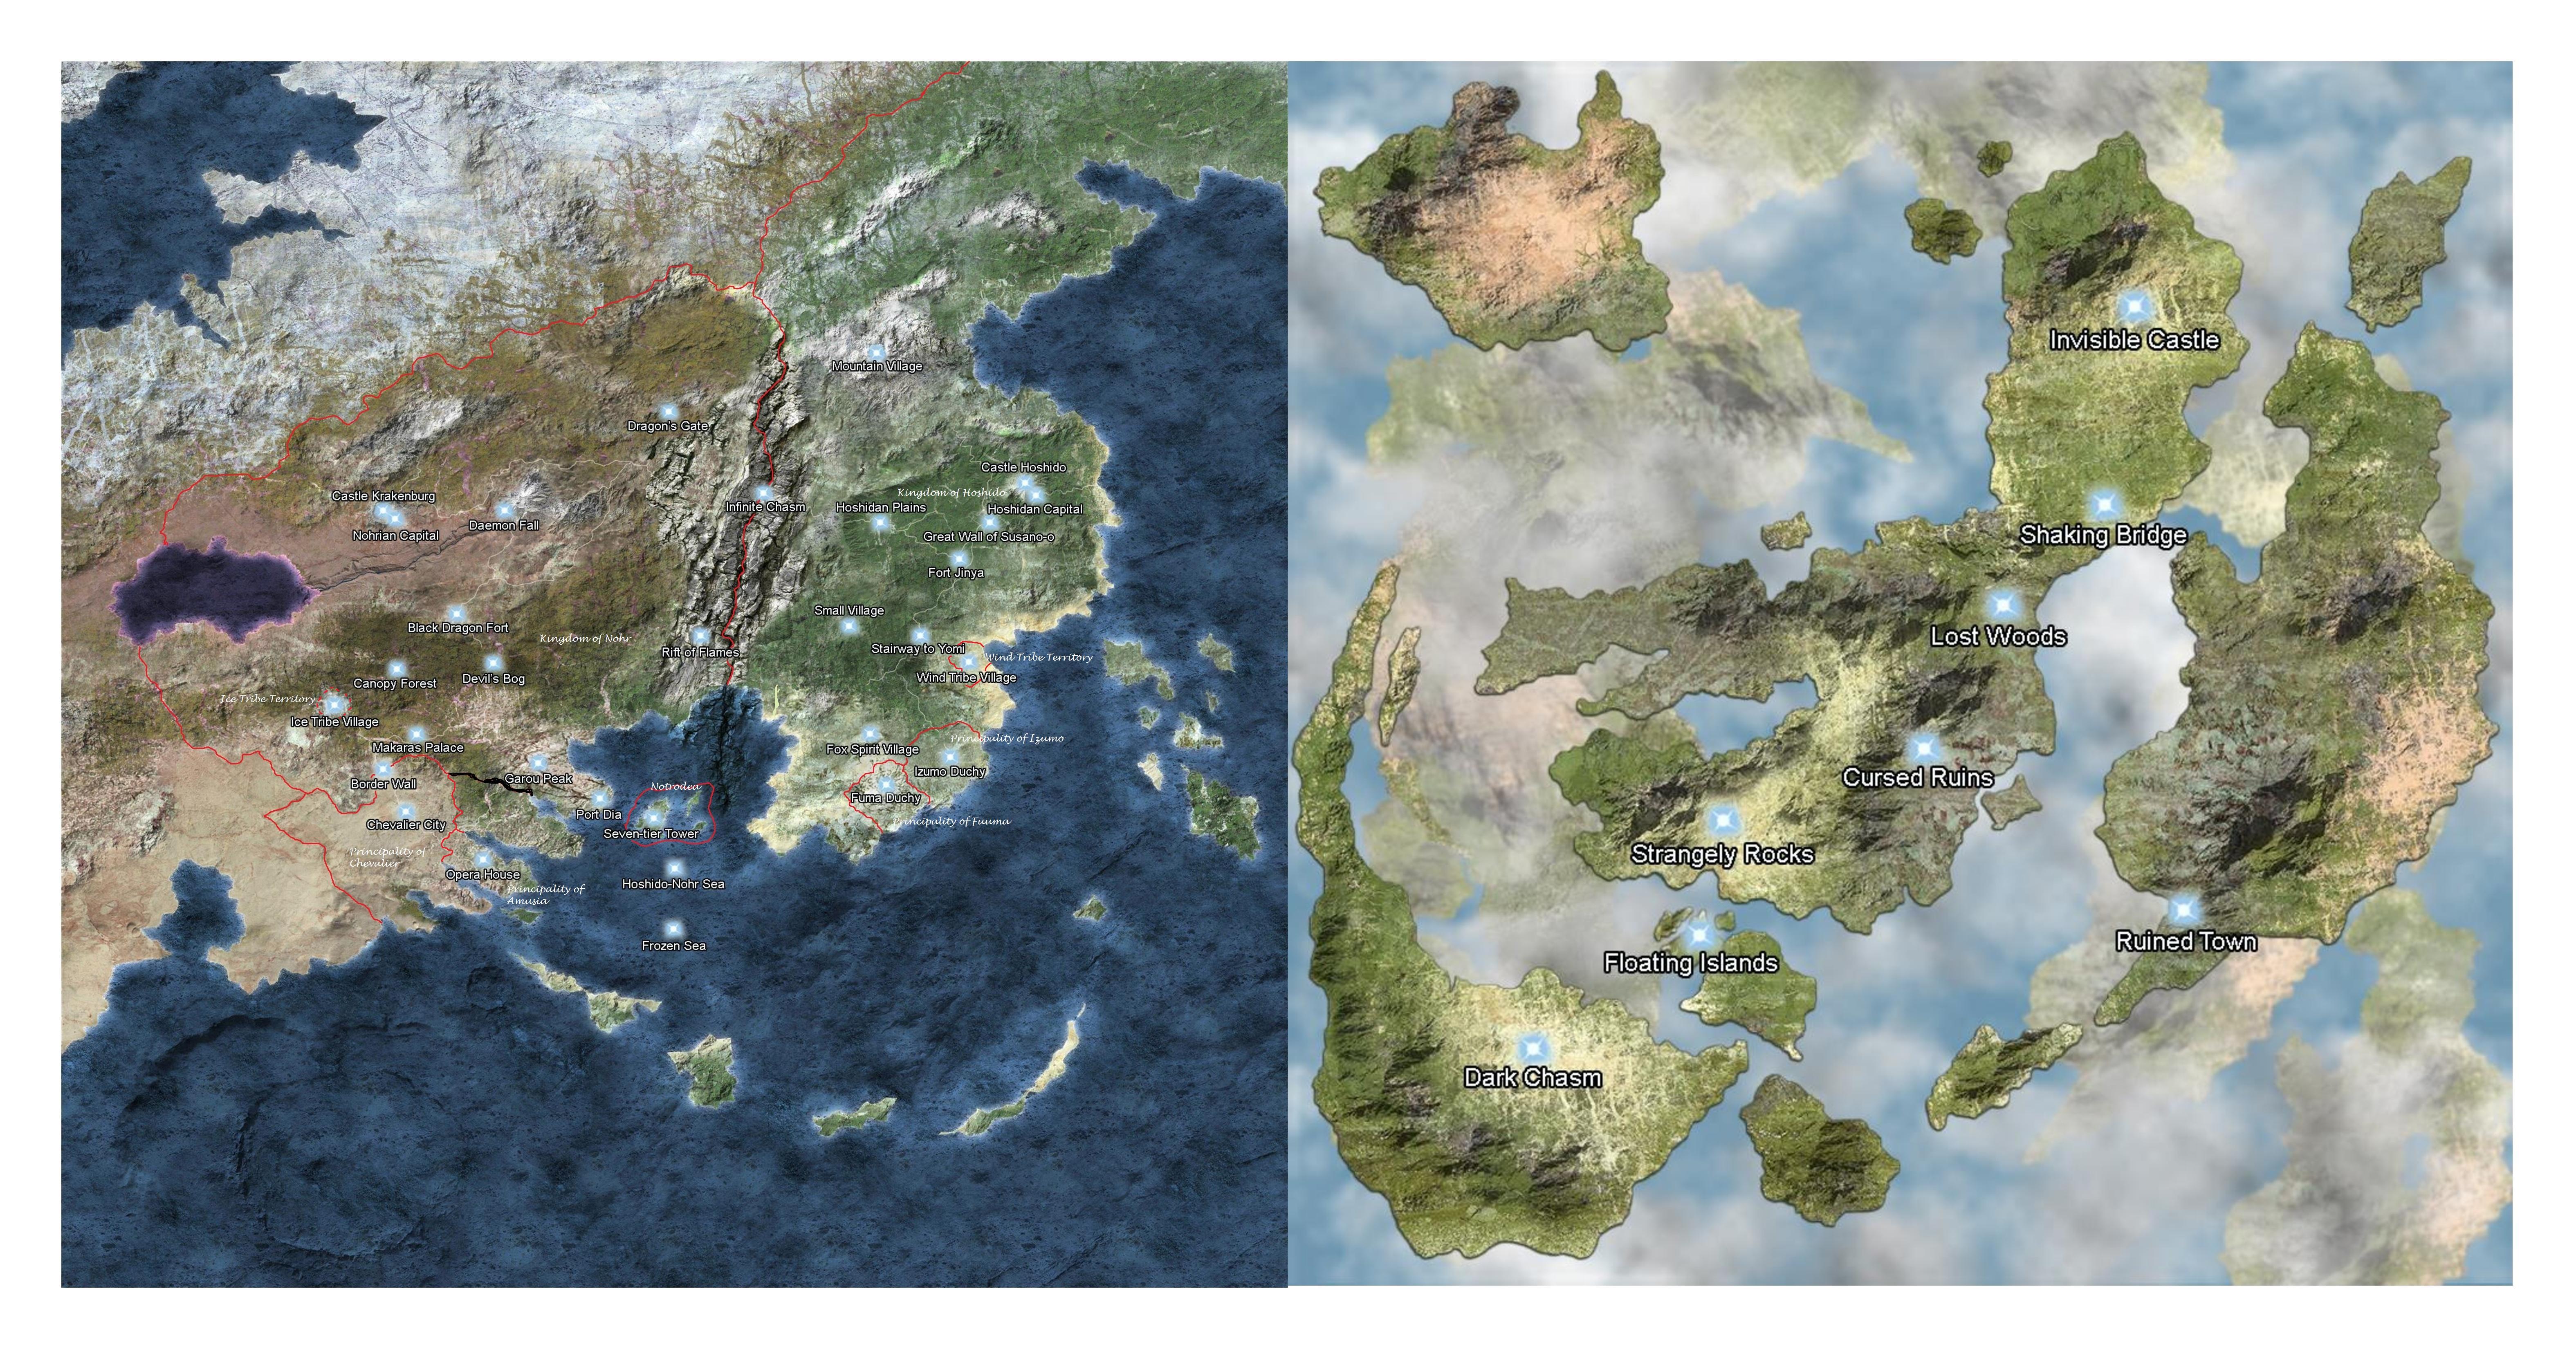 Fire Emblem Fates World Map Edit 4 By Swordswoman15 On Deviantart